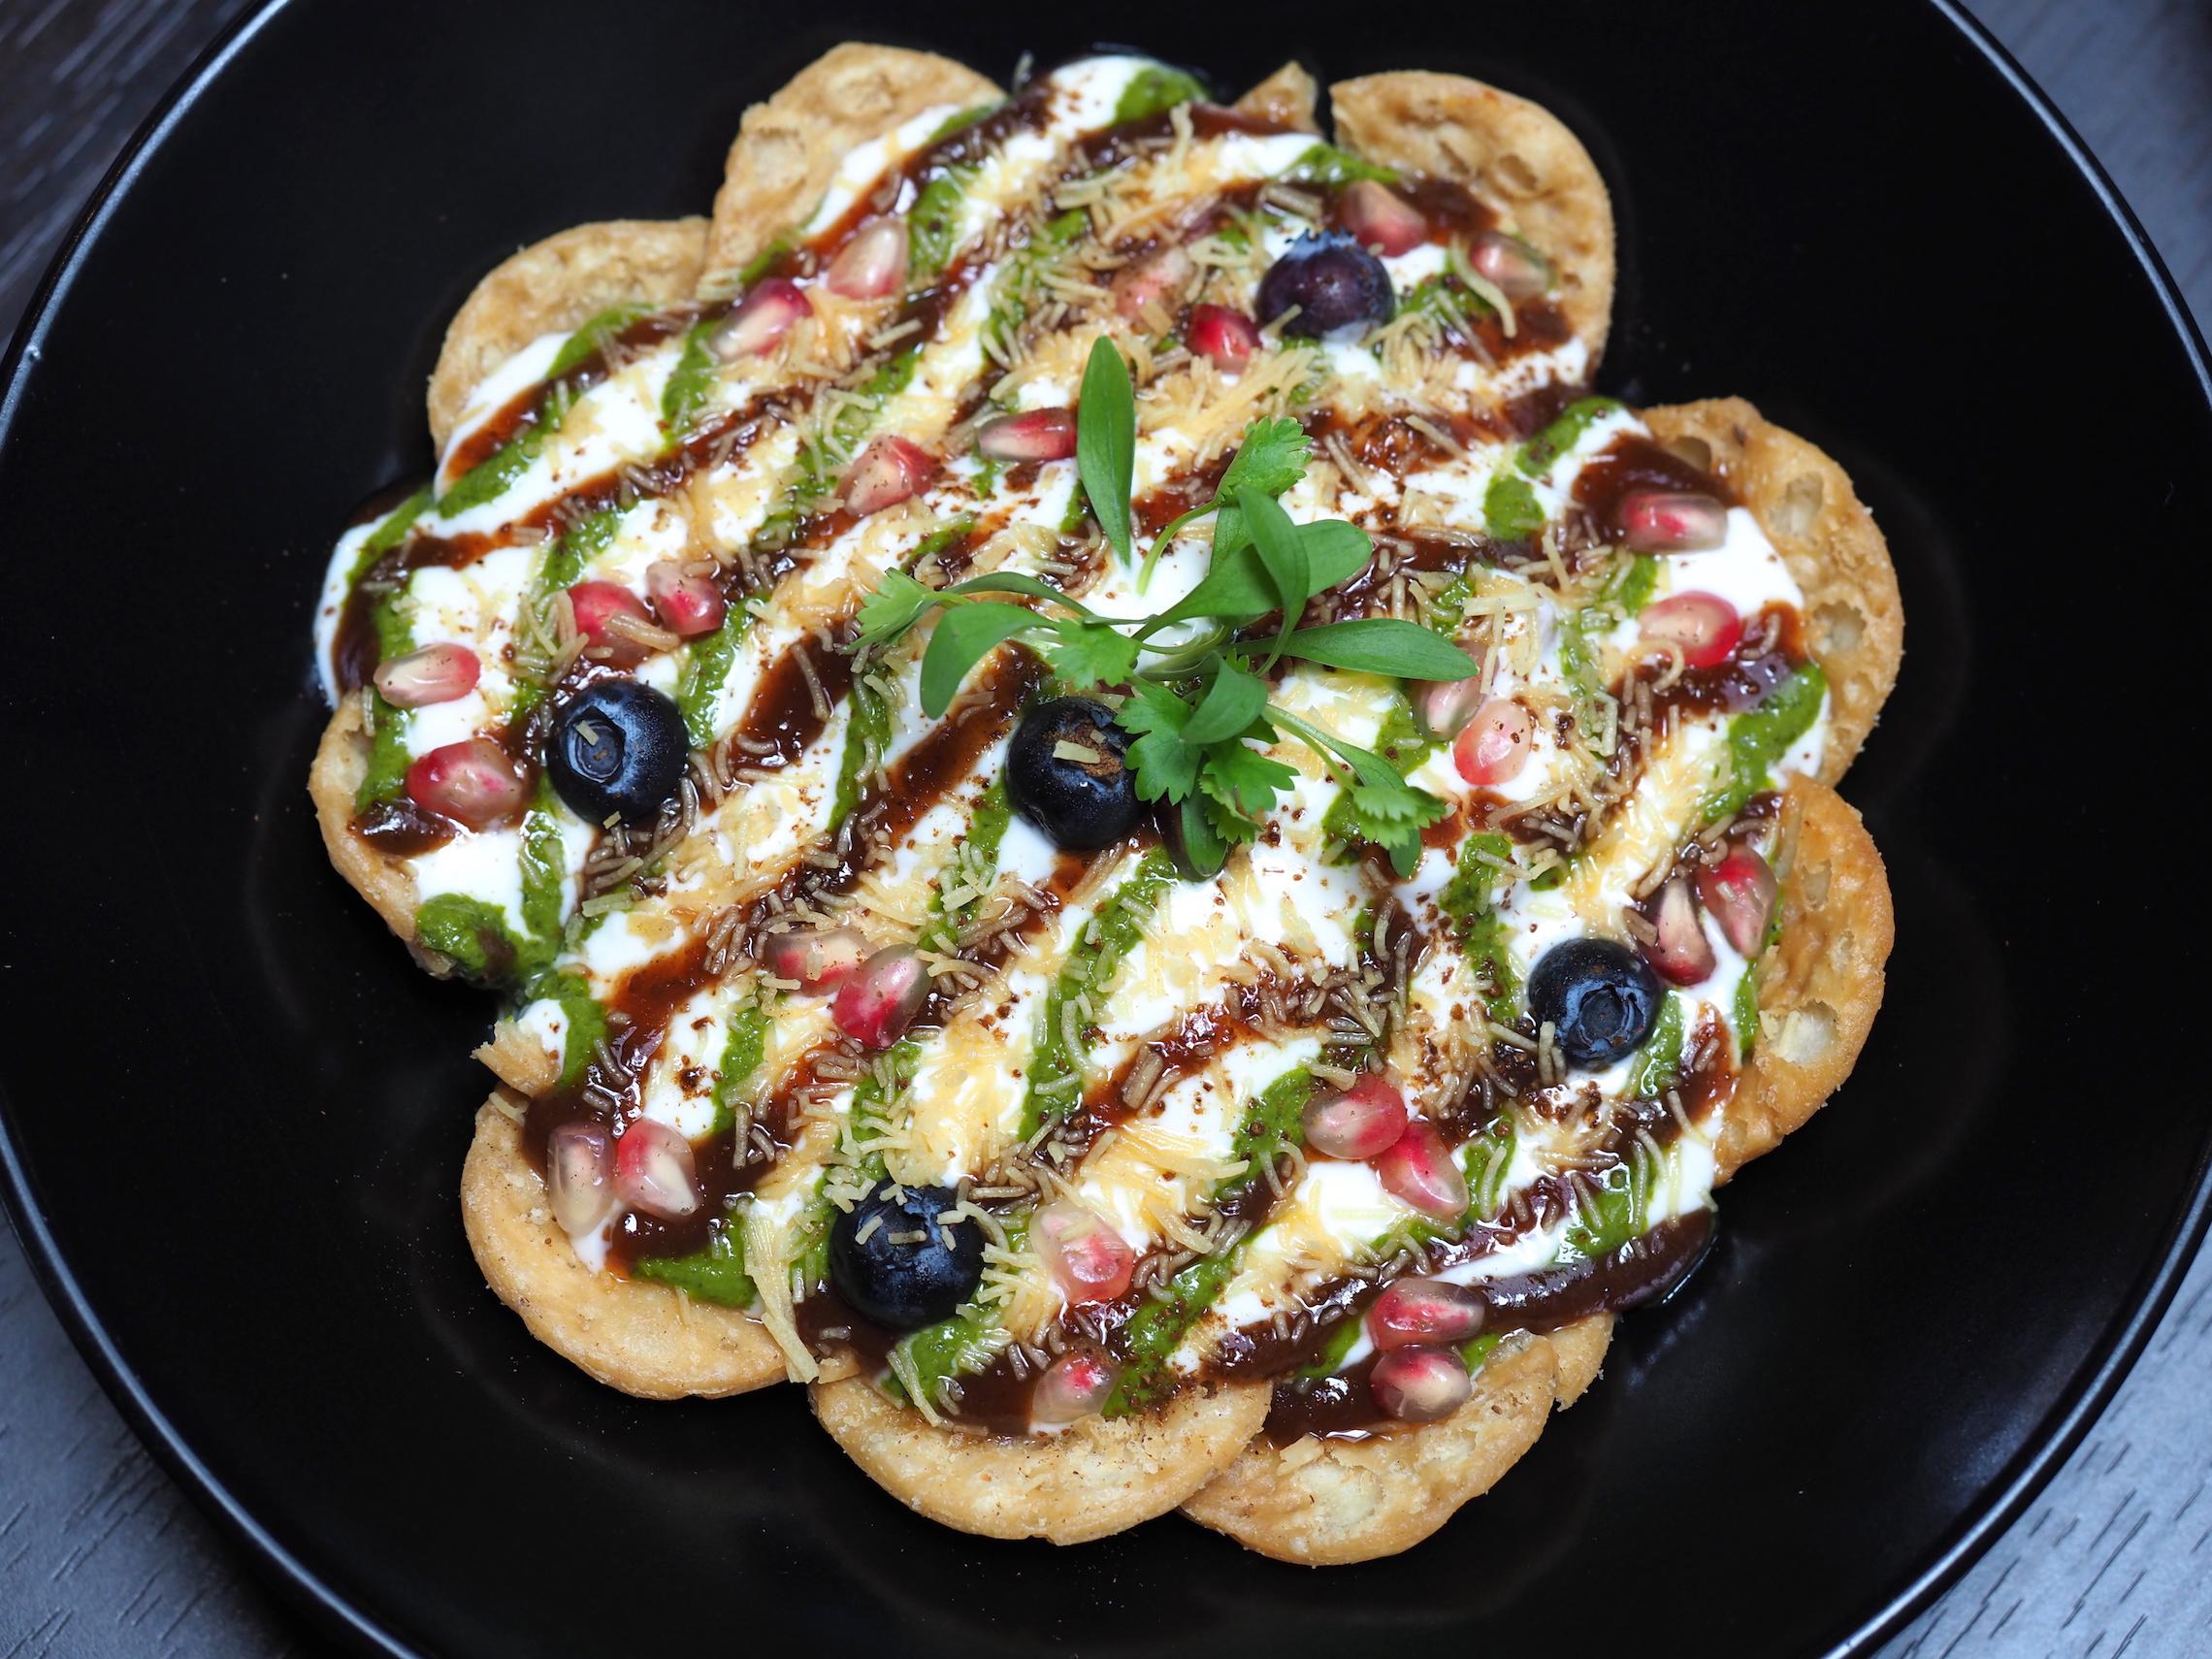 tamarind chutney, imli ki chatni and mint chutney drizzled over fruit salad